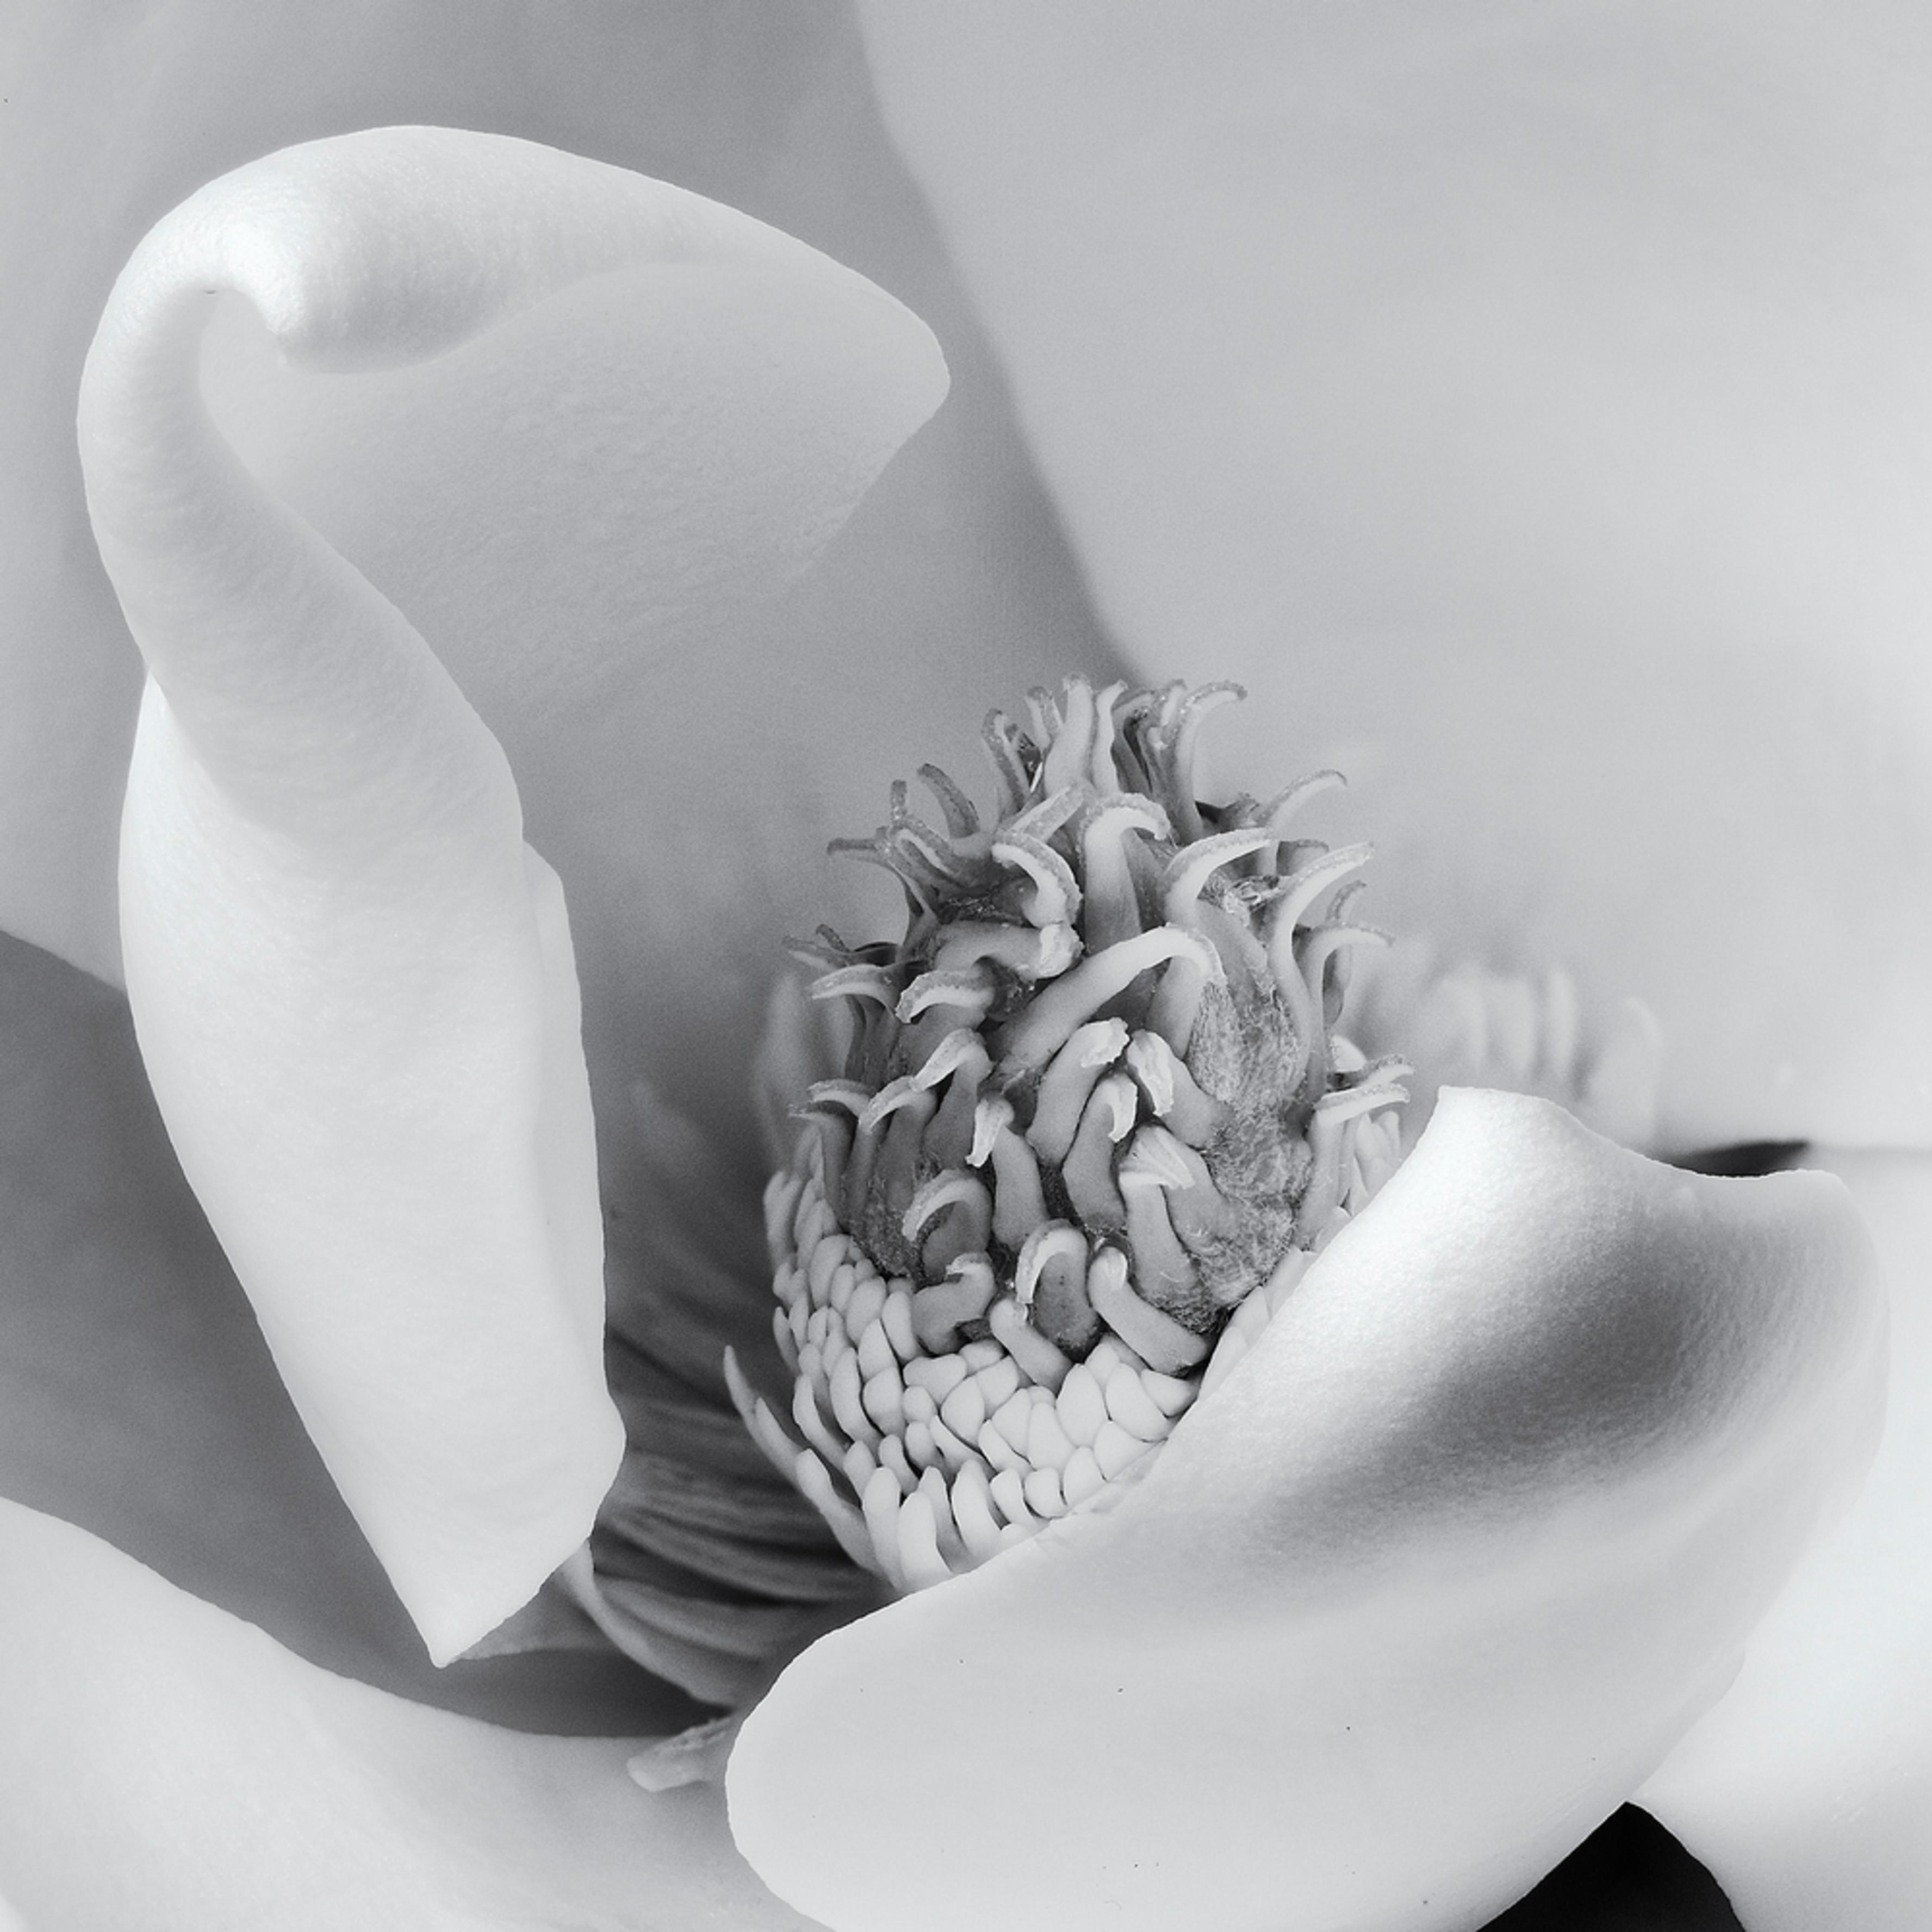 Magnolia pistil 2 bv8mww